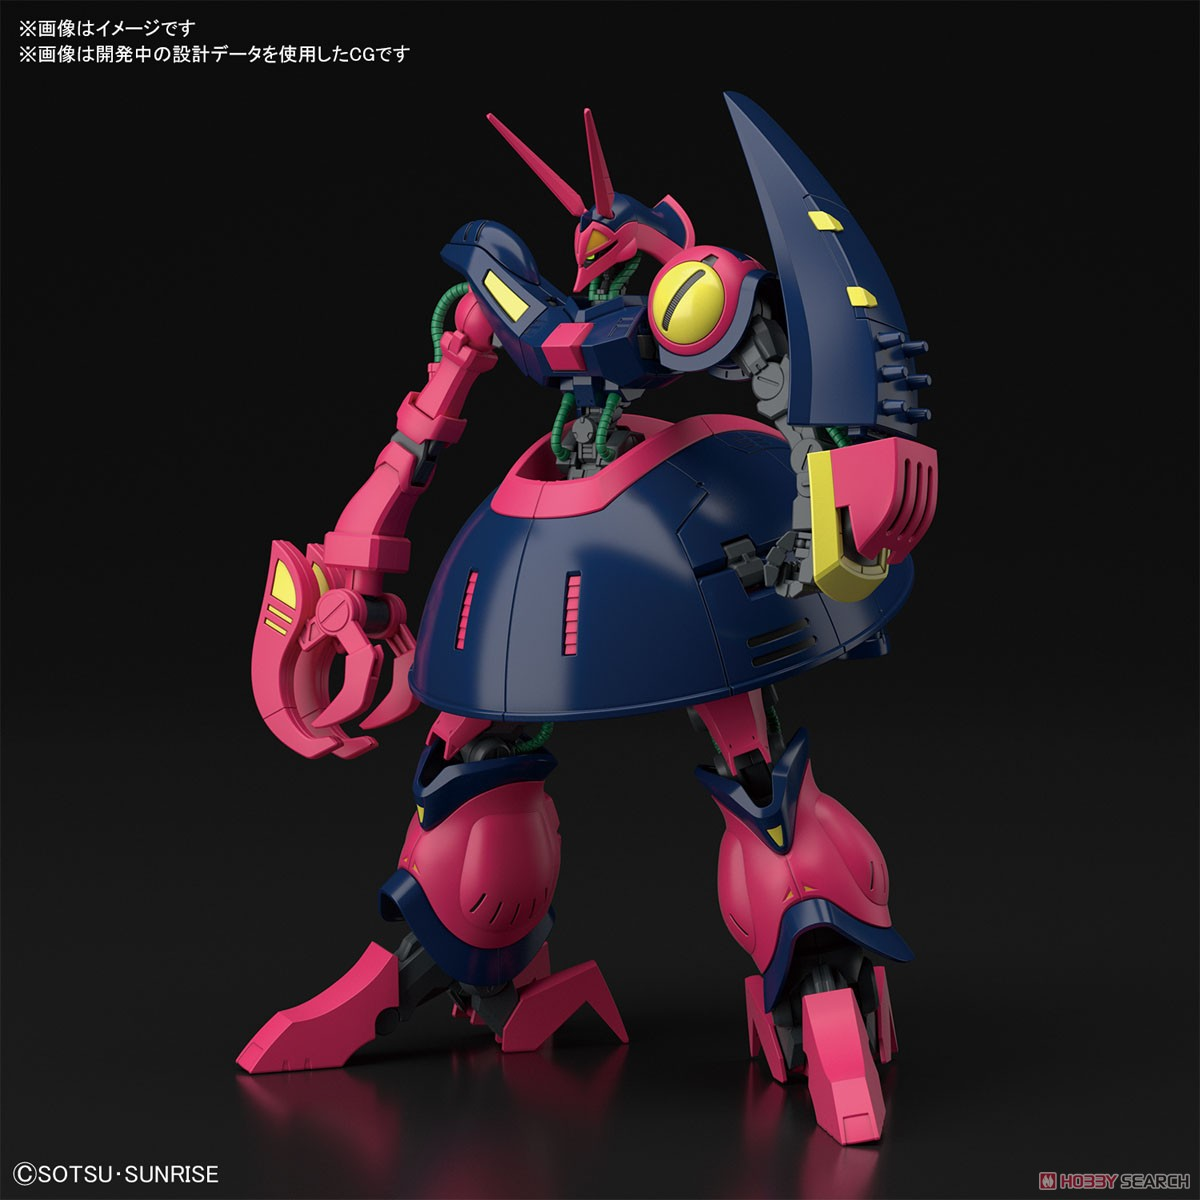 HGUC 1/144『バウンド・ドック』機動戦士Zガンダム プラモデル-011